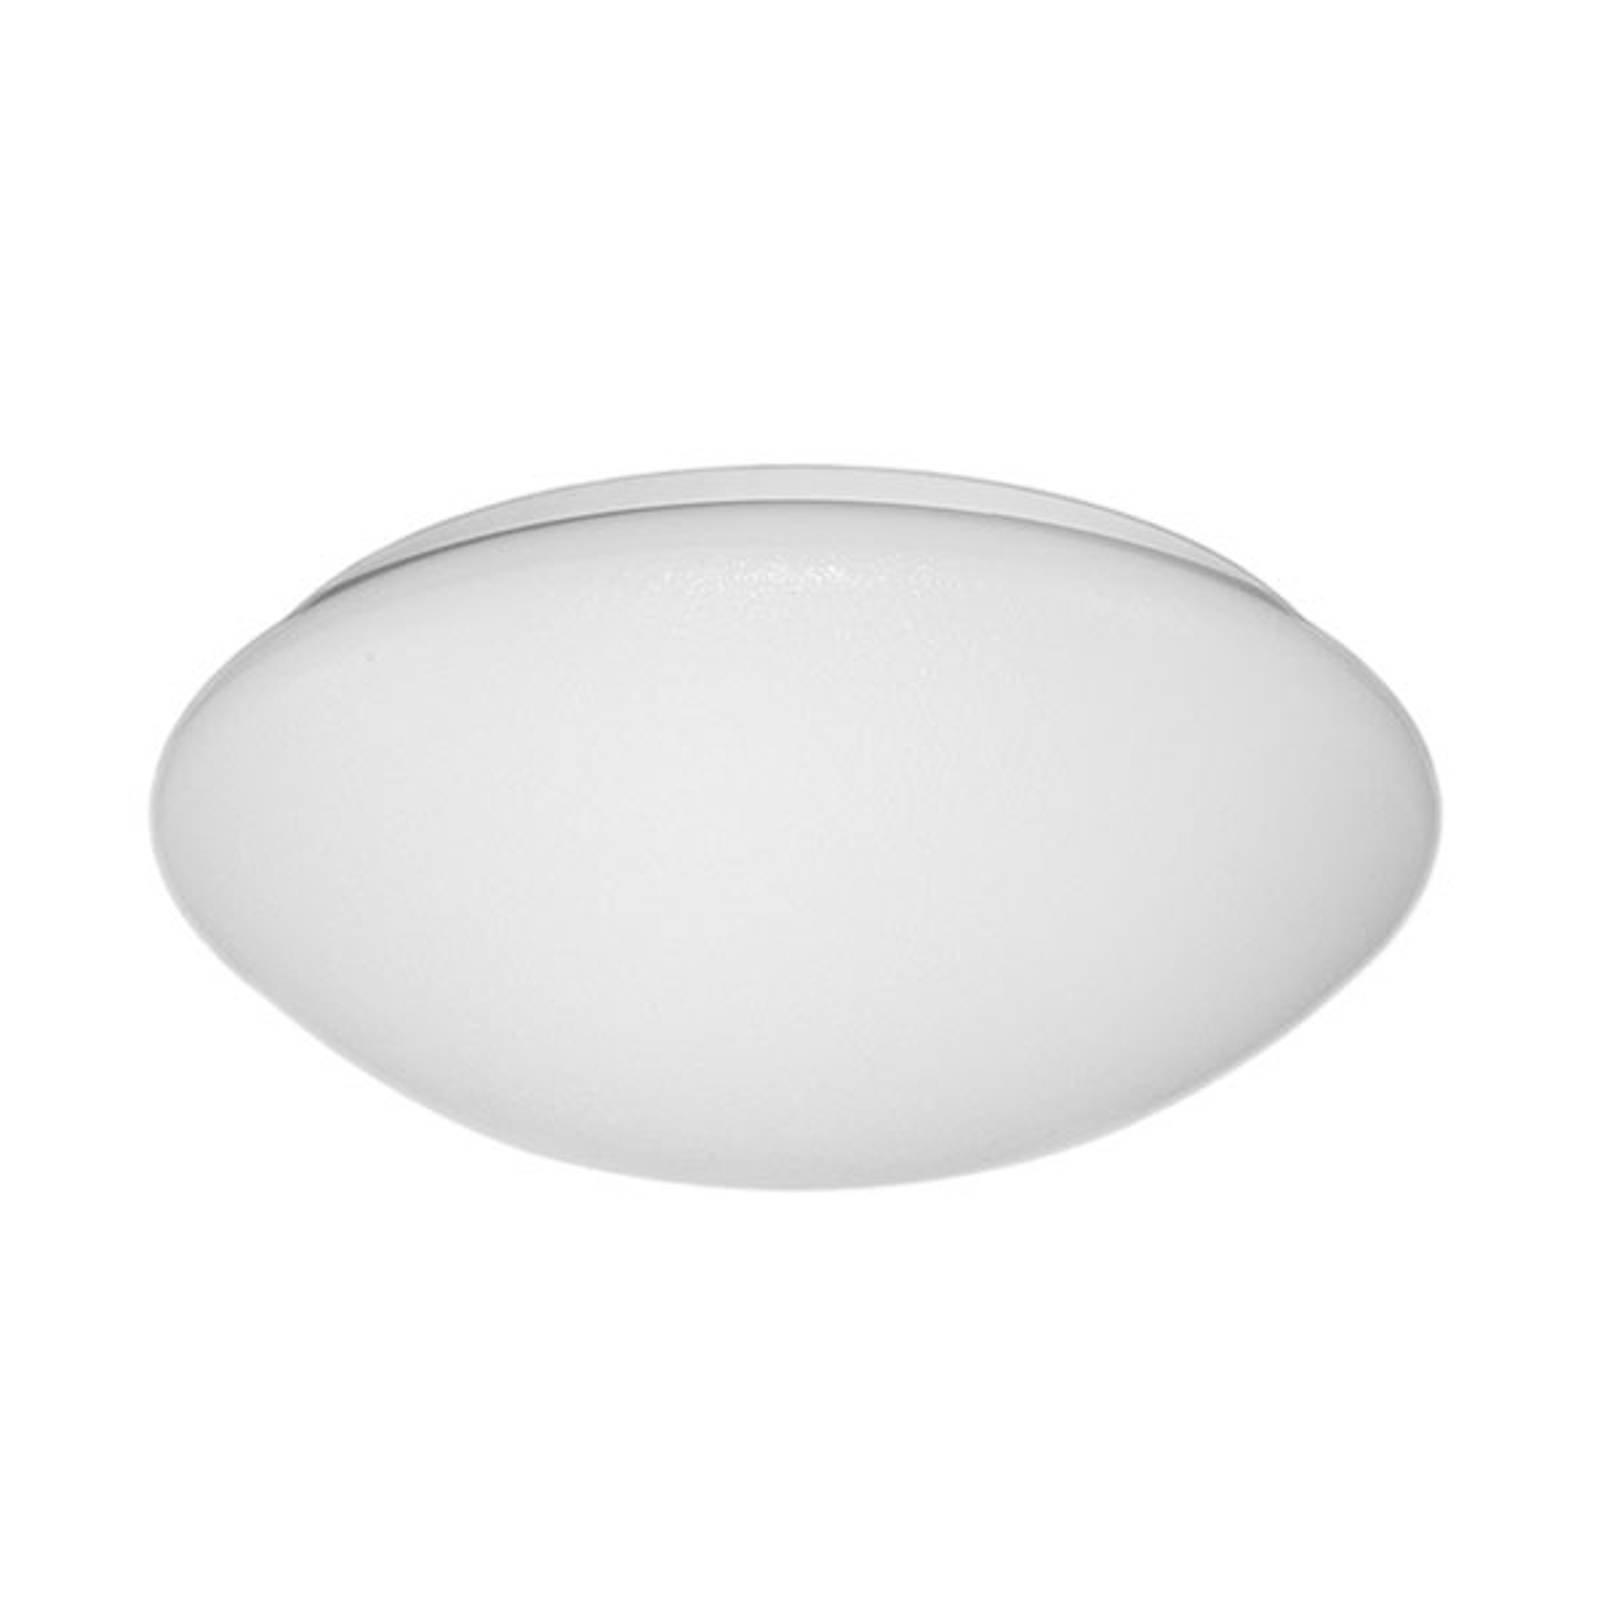 LED-taklampe, bruddsikker, 27 W, 4 000 K